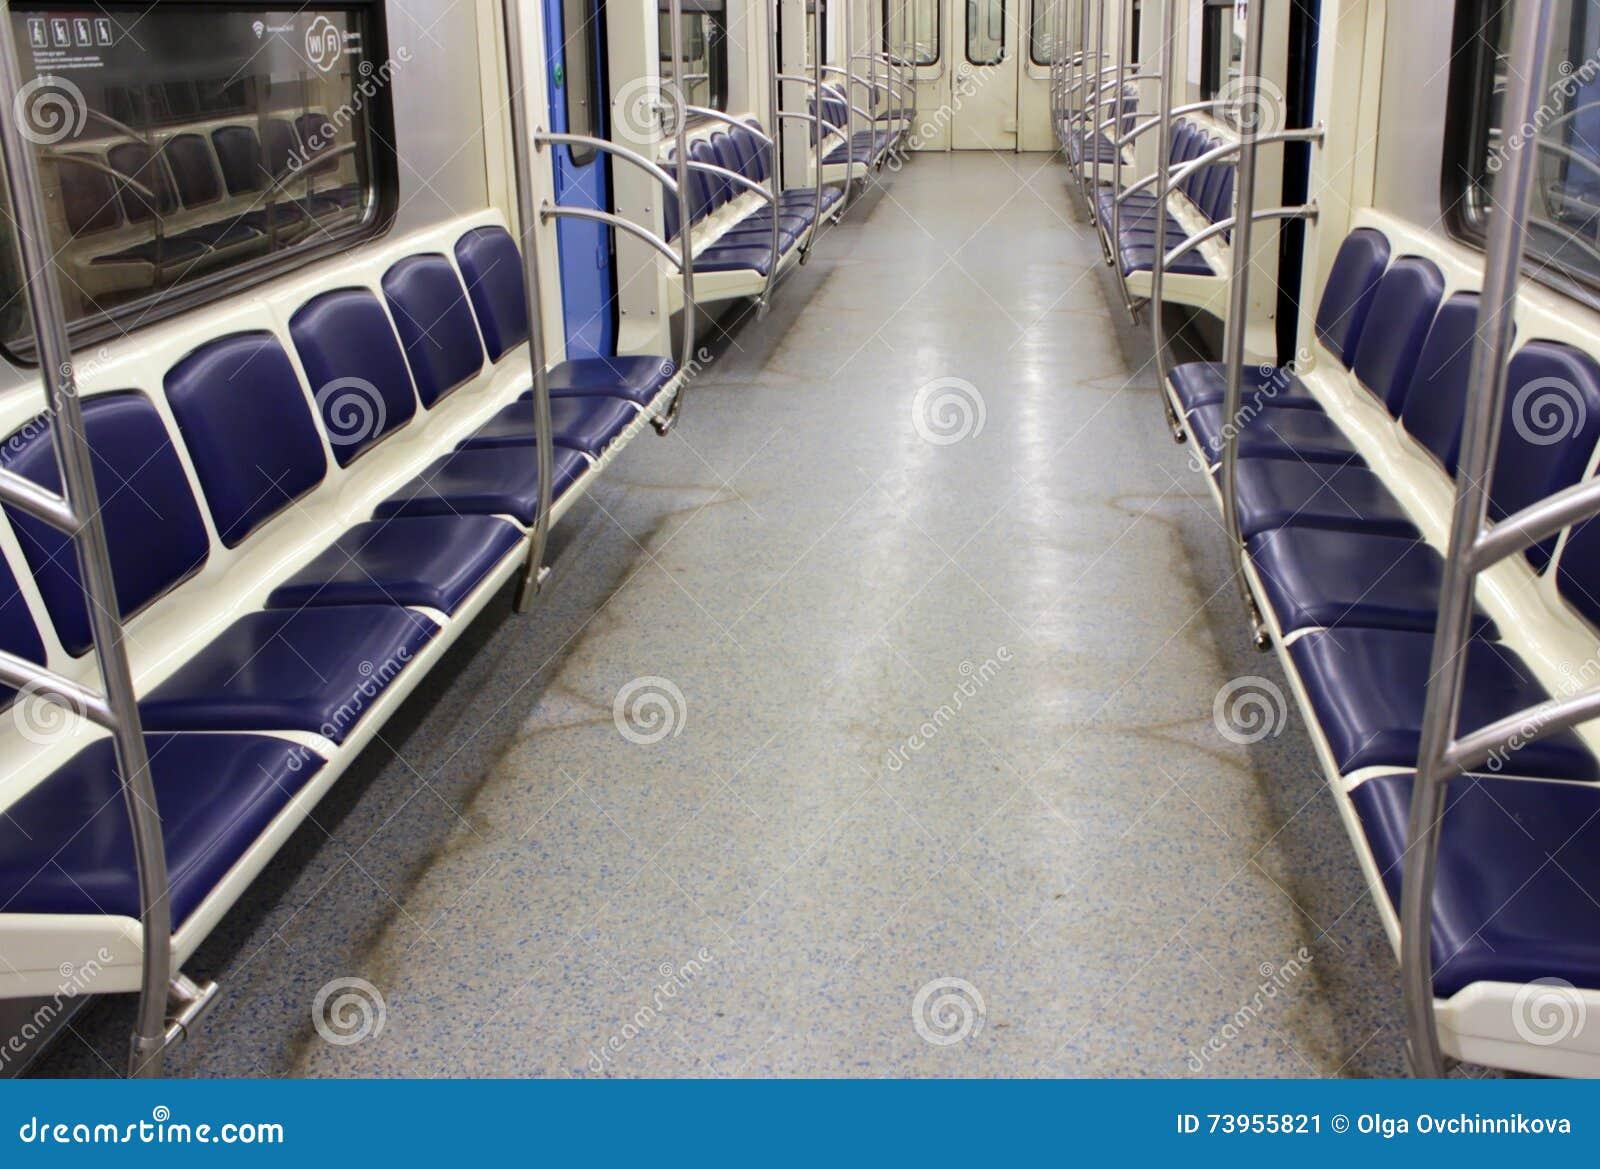 empty wagon train on the Moscow Metro